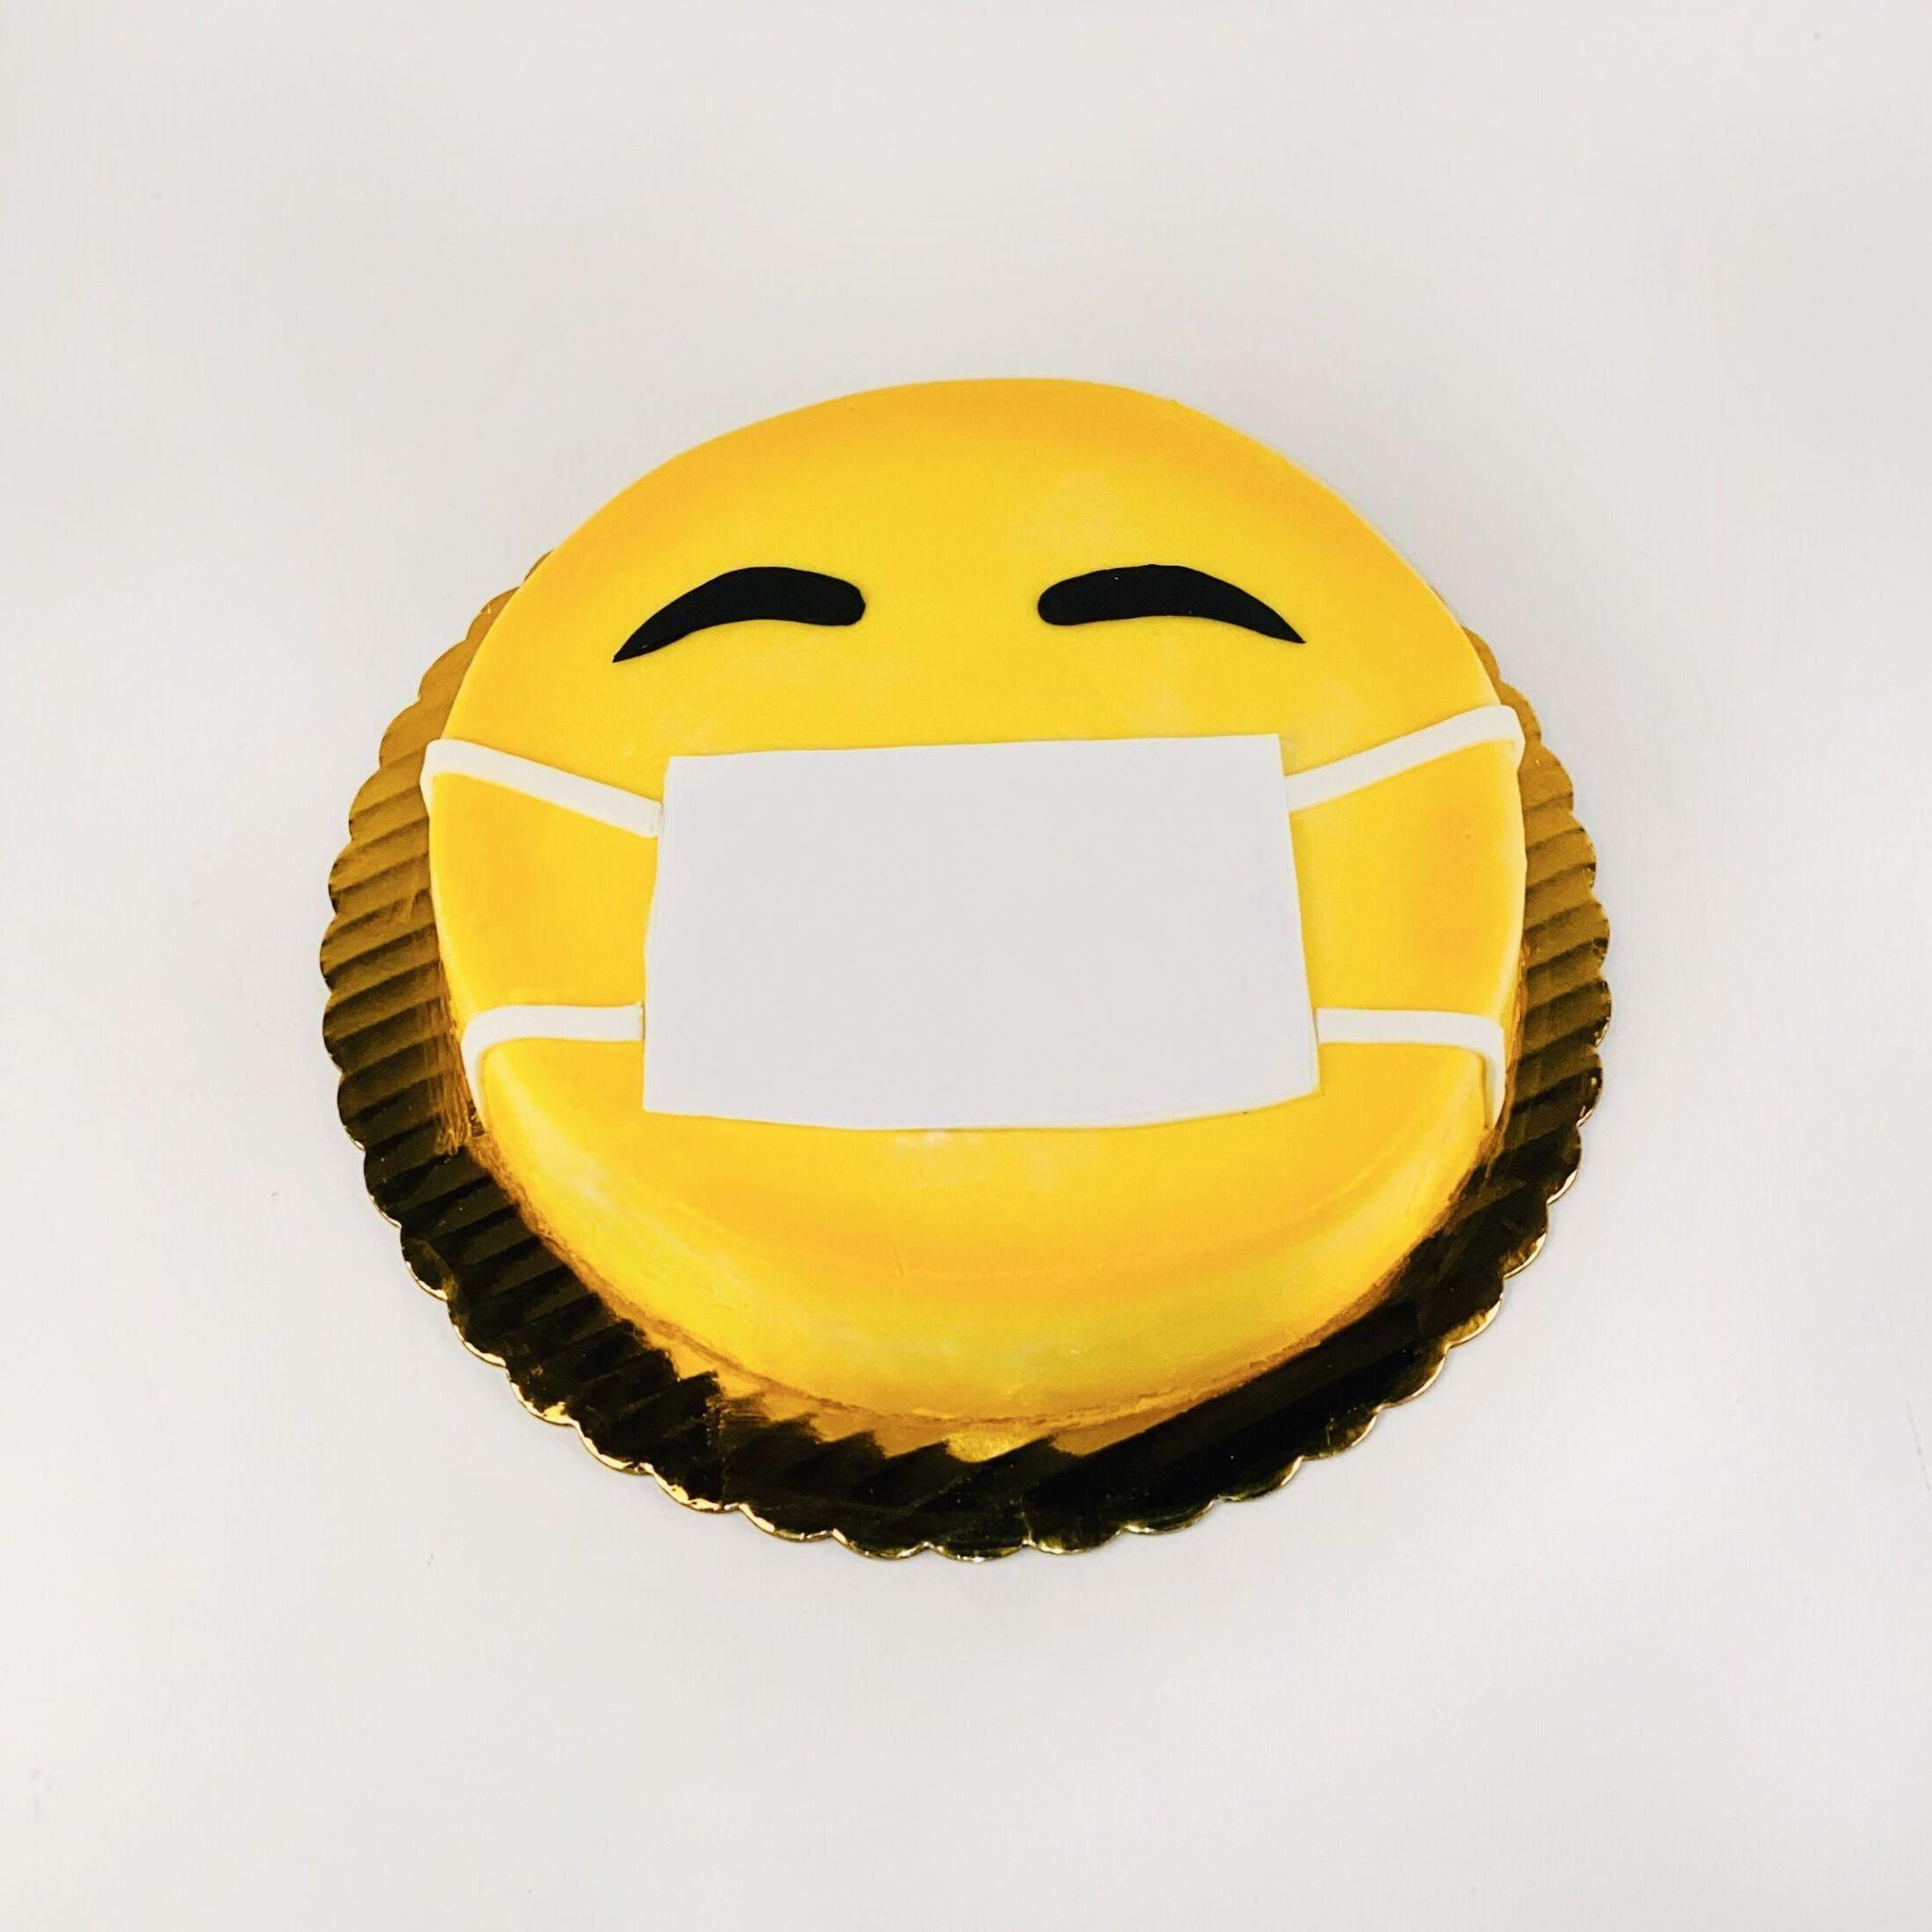 Face Mask Emoji In 2020 Emoji Cake Birthday Cake Kids Corona Cake